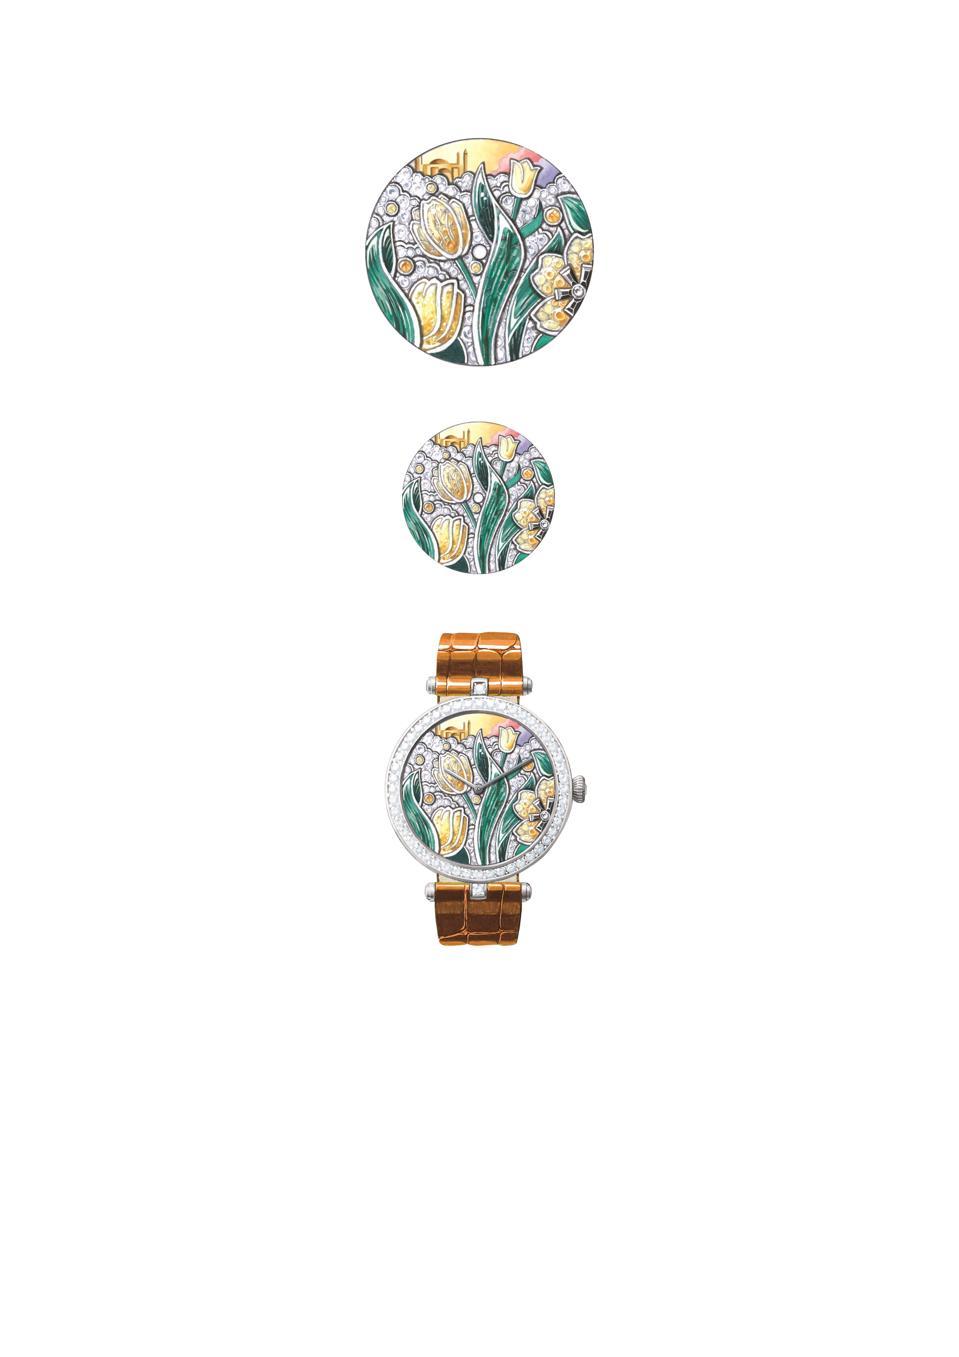 Van Cleef & Arpels Extraordinary Dials Lady Arpels Poème Tulipe watch